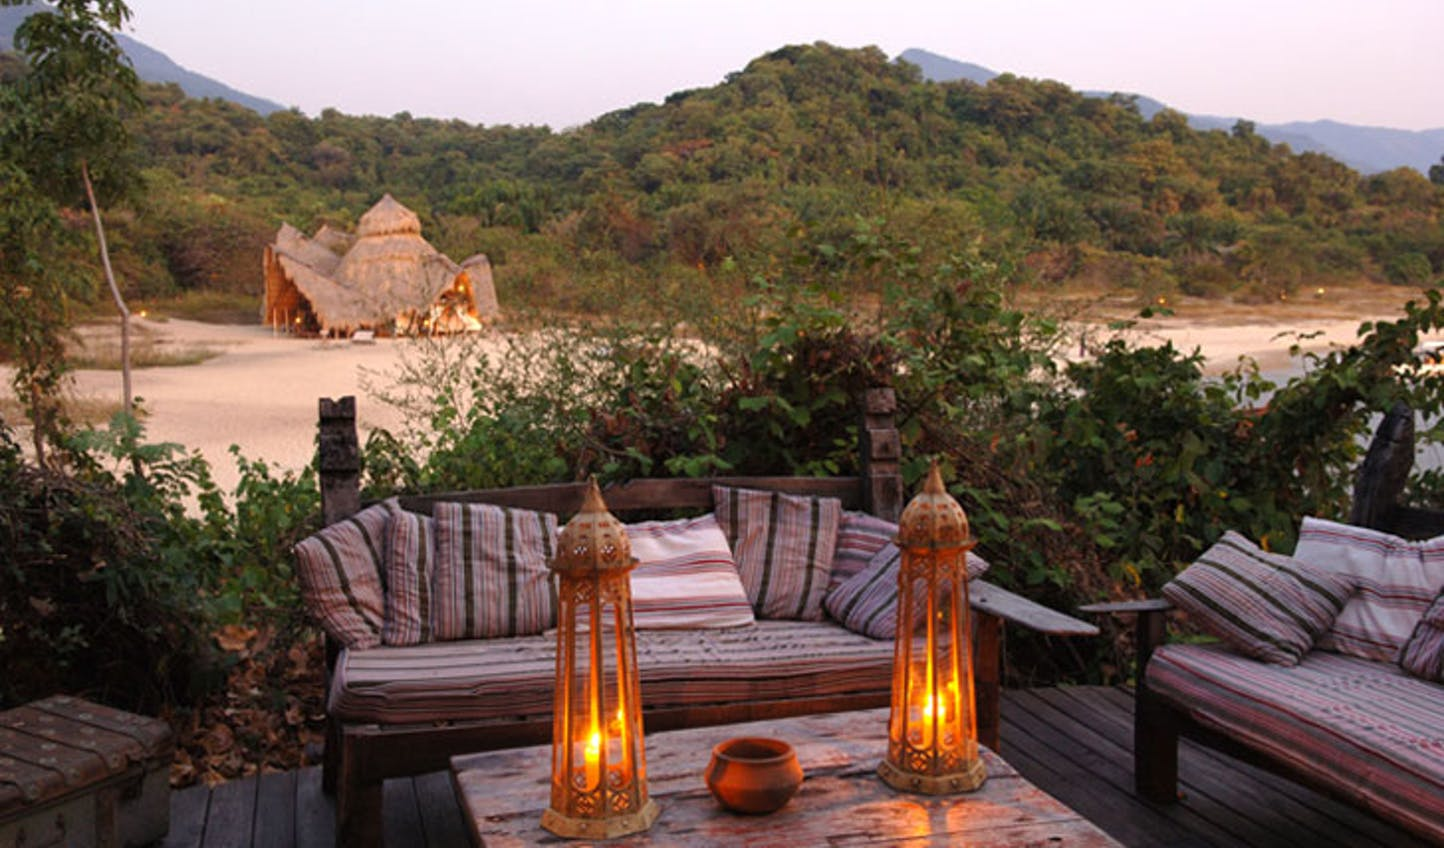 A Seregneti luxury safari and Zanzibar beach holiday